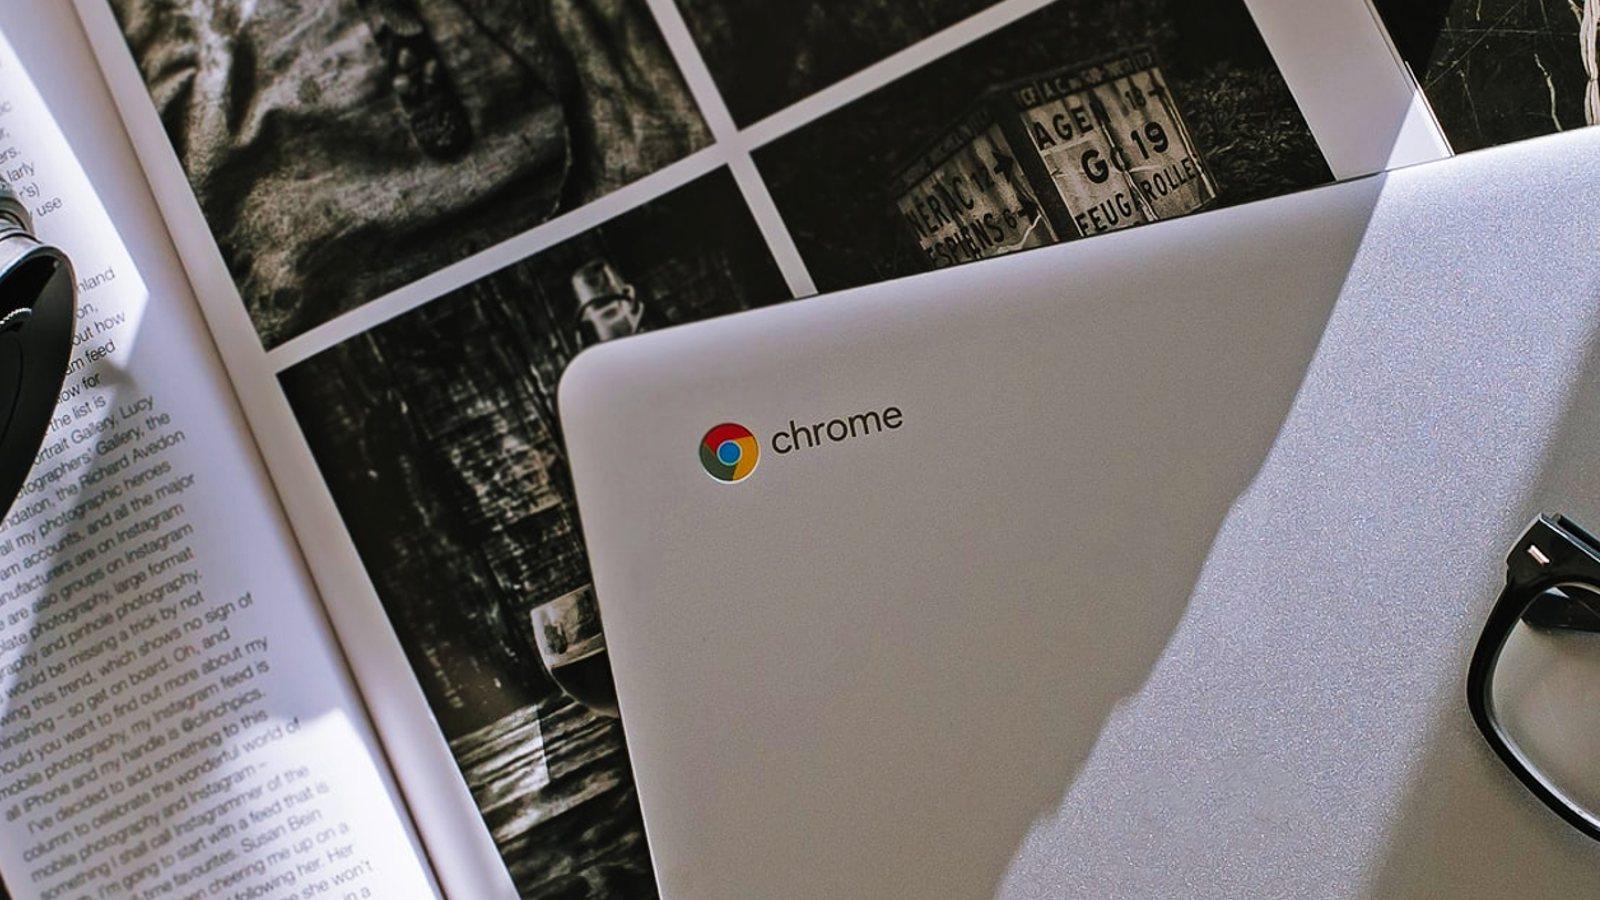 Google Chromebook bug causes black screens after login